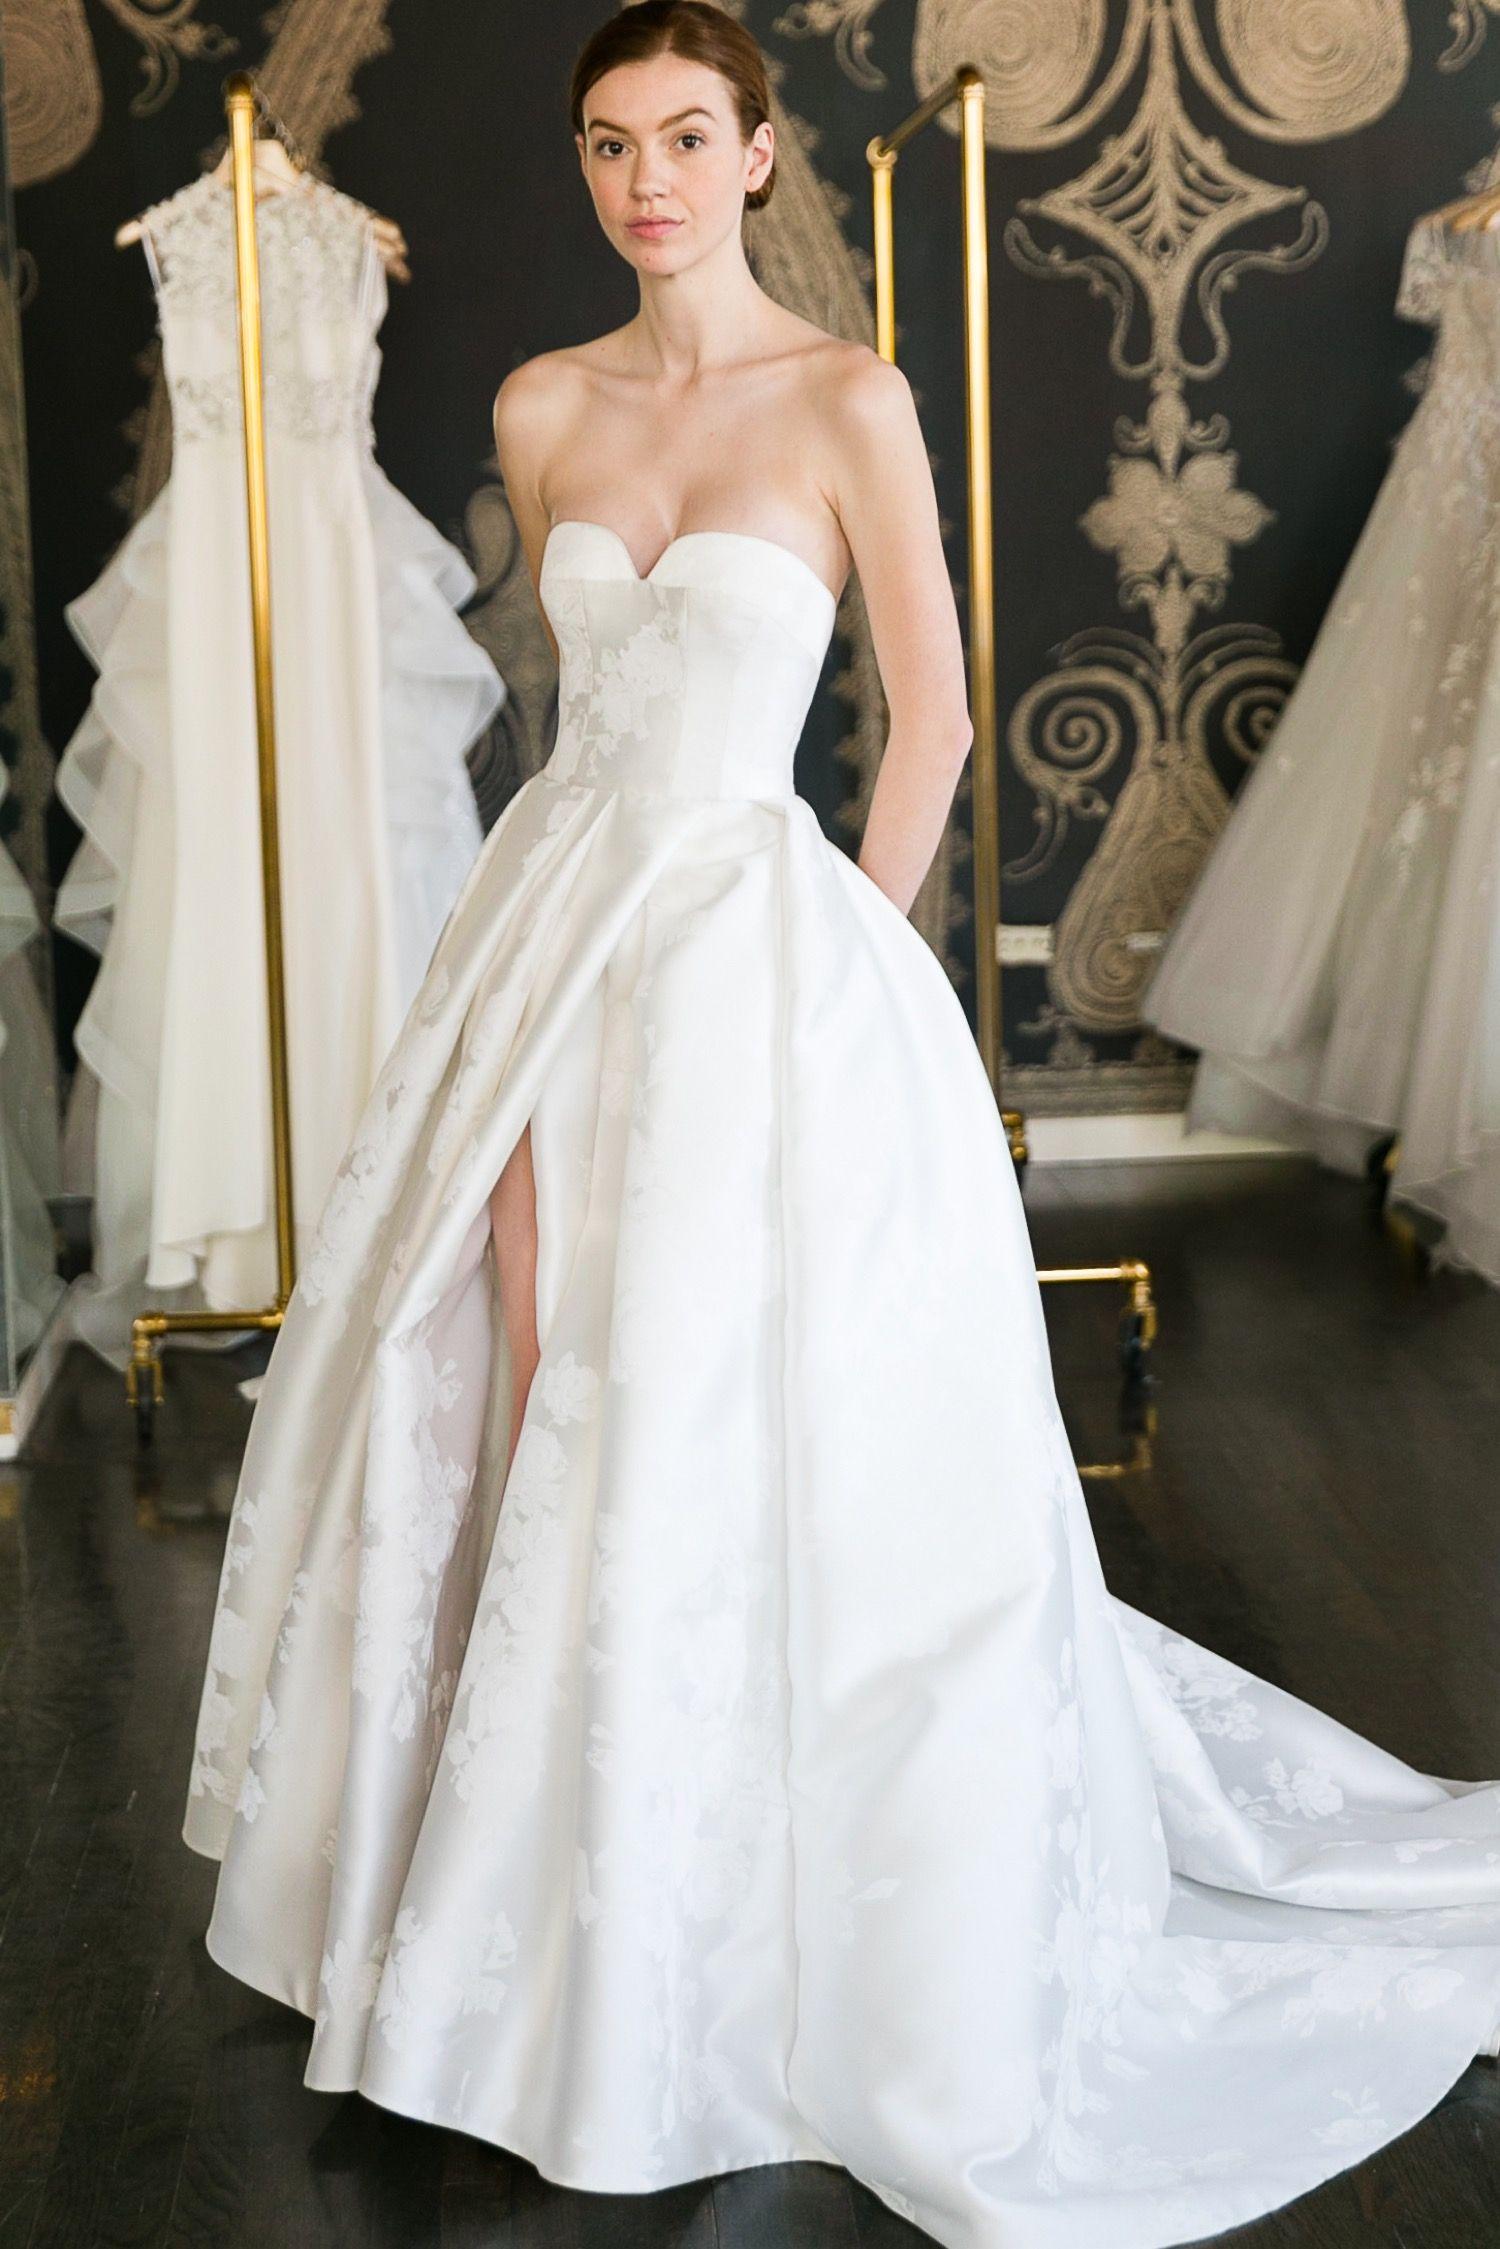 Reem Acra Wedding Dress Designer Wedding Dress Trunk Show At Jessica Haley Bridal In R Reem Acra Wedding Dress Bridal Gowns Vintage Wedding Dresses Strapless